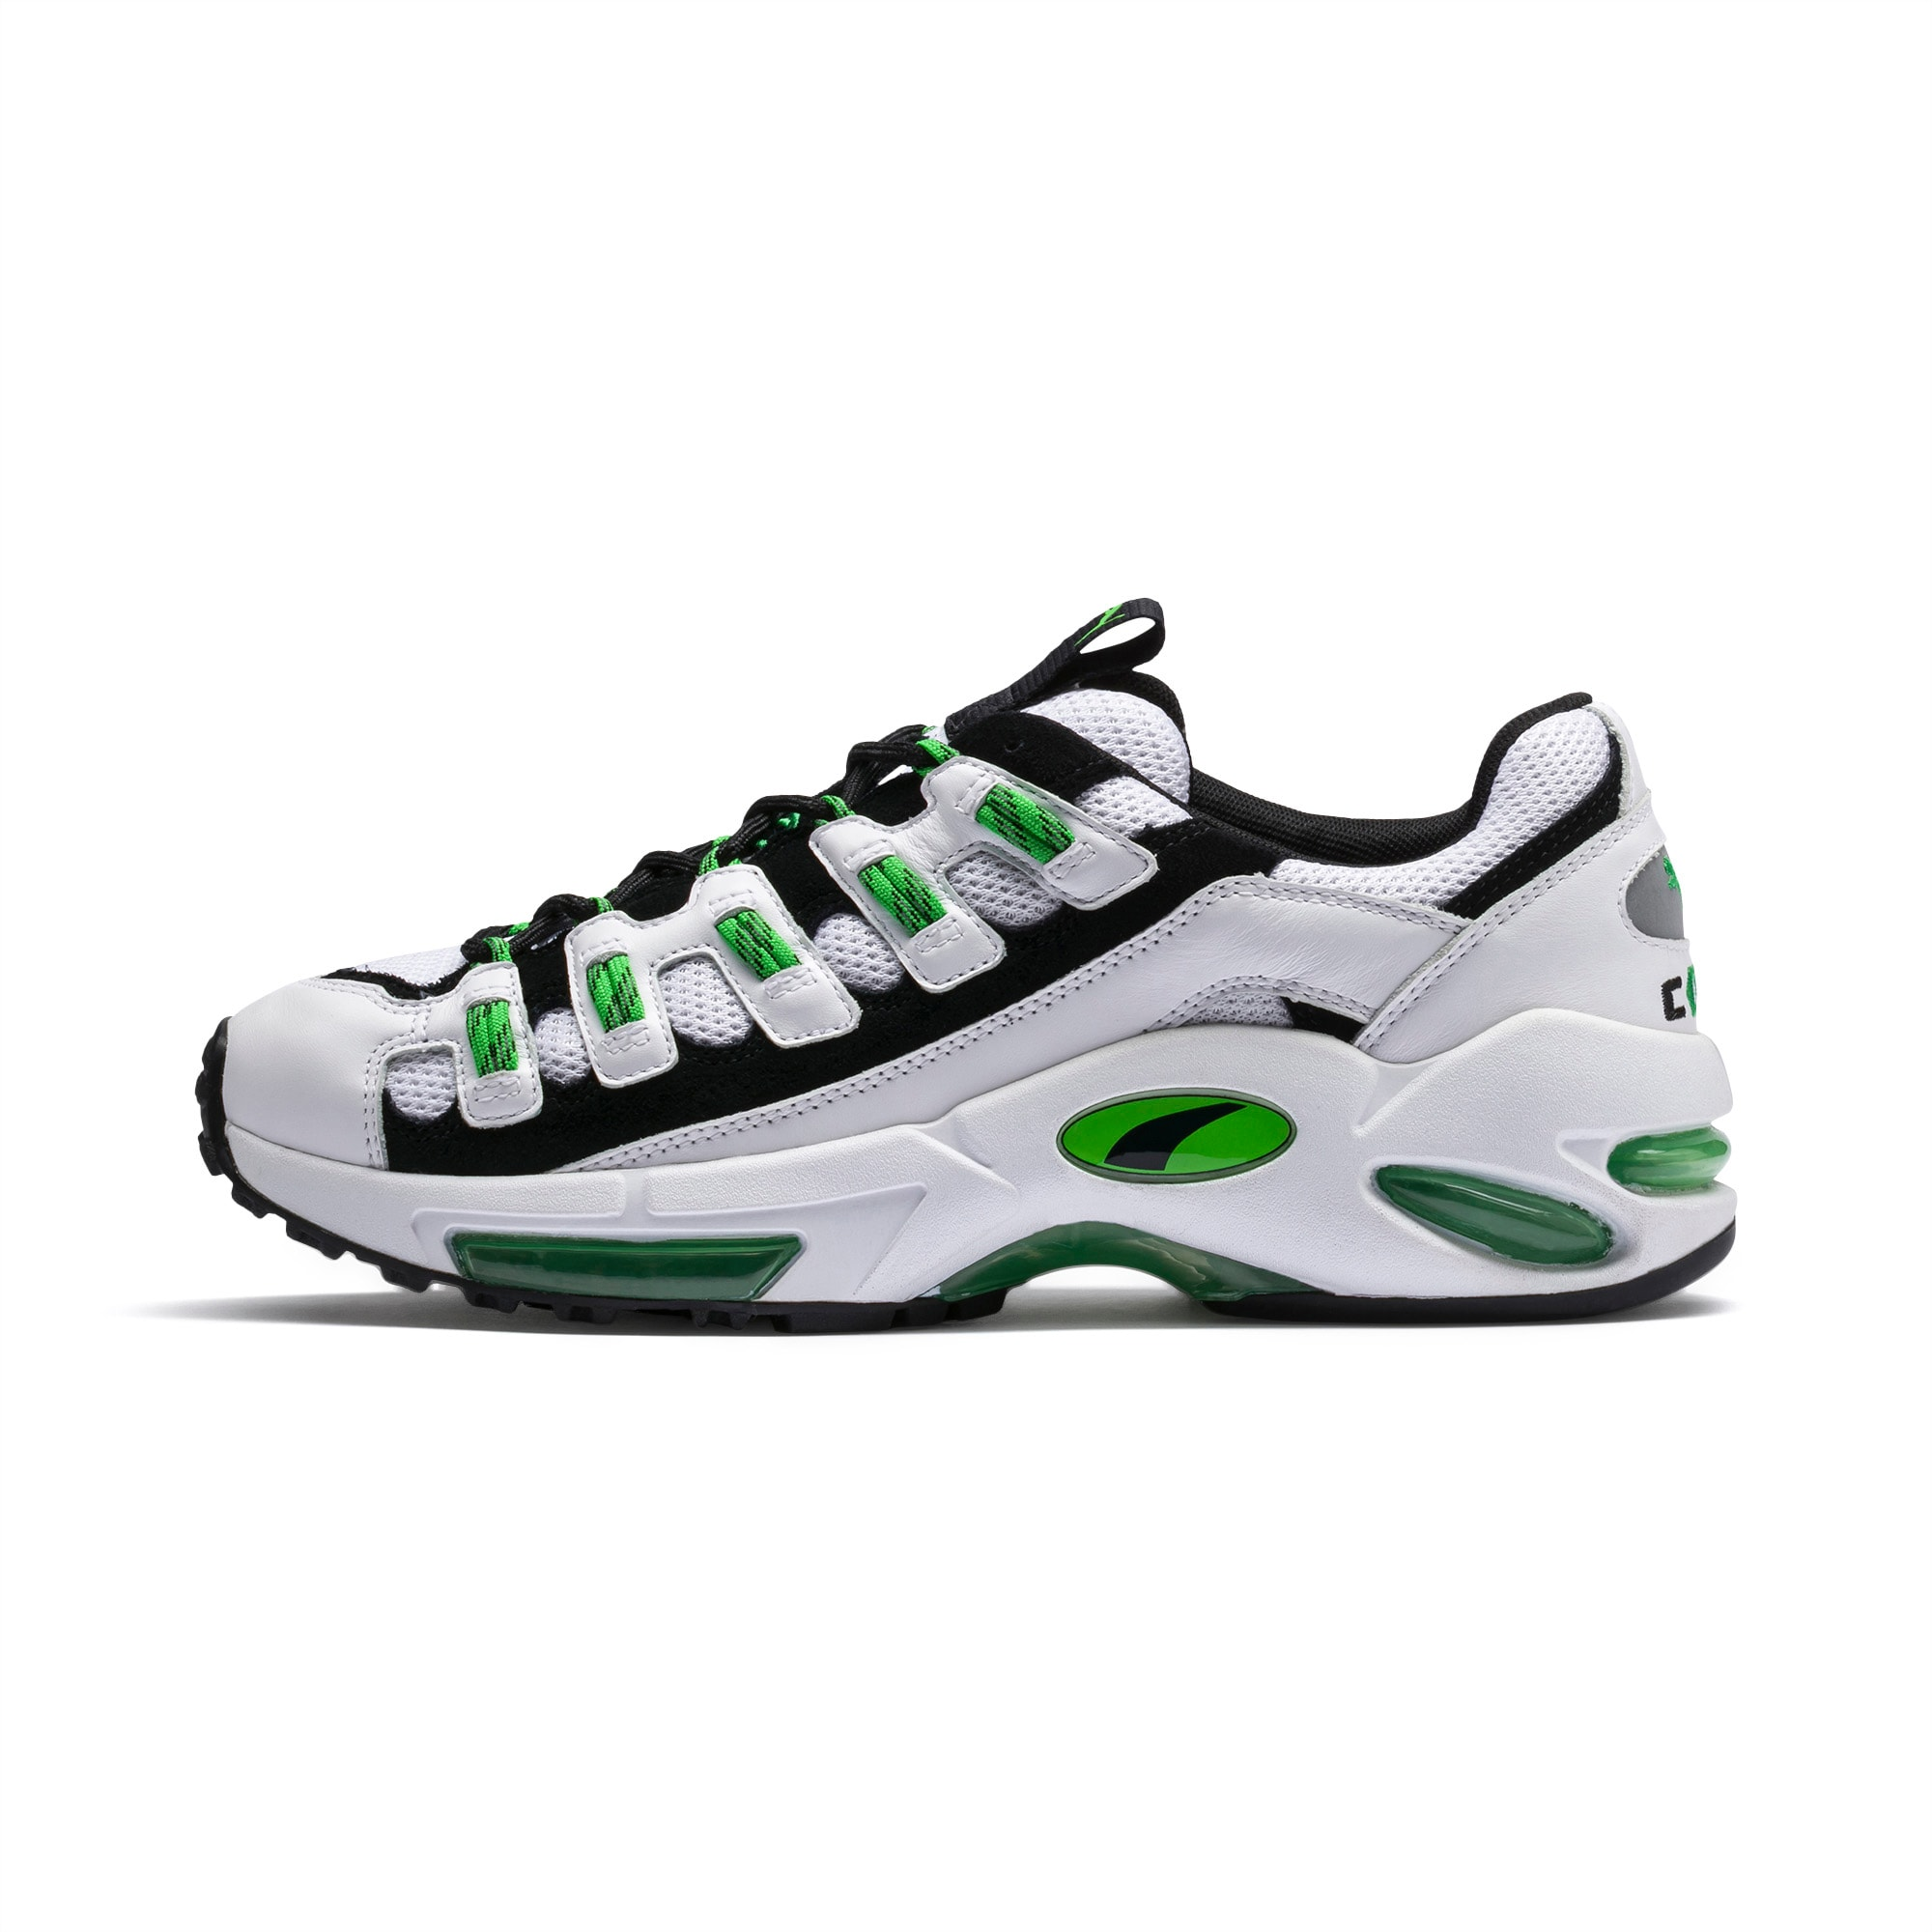 Cell Endura Trainers | 01 | PUMA Sneakers | PUMA